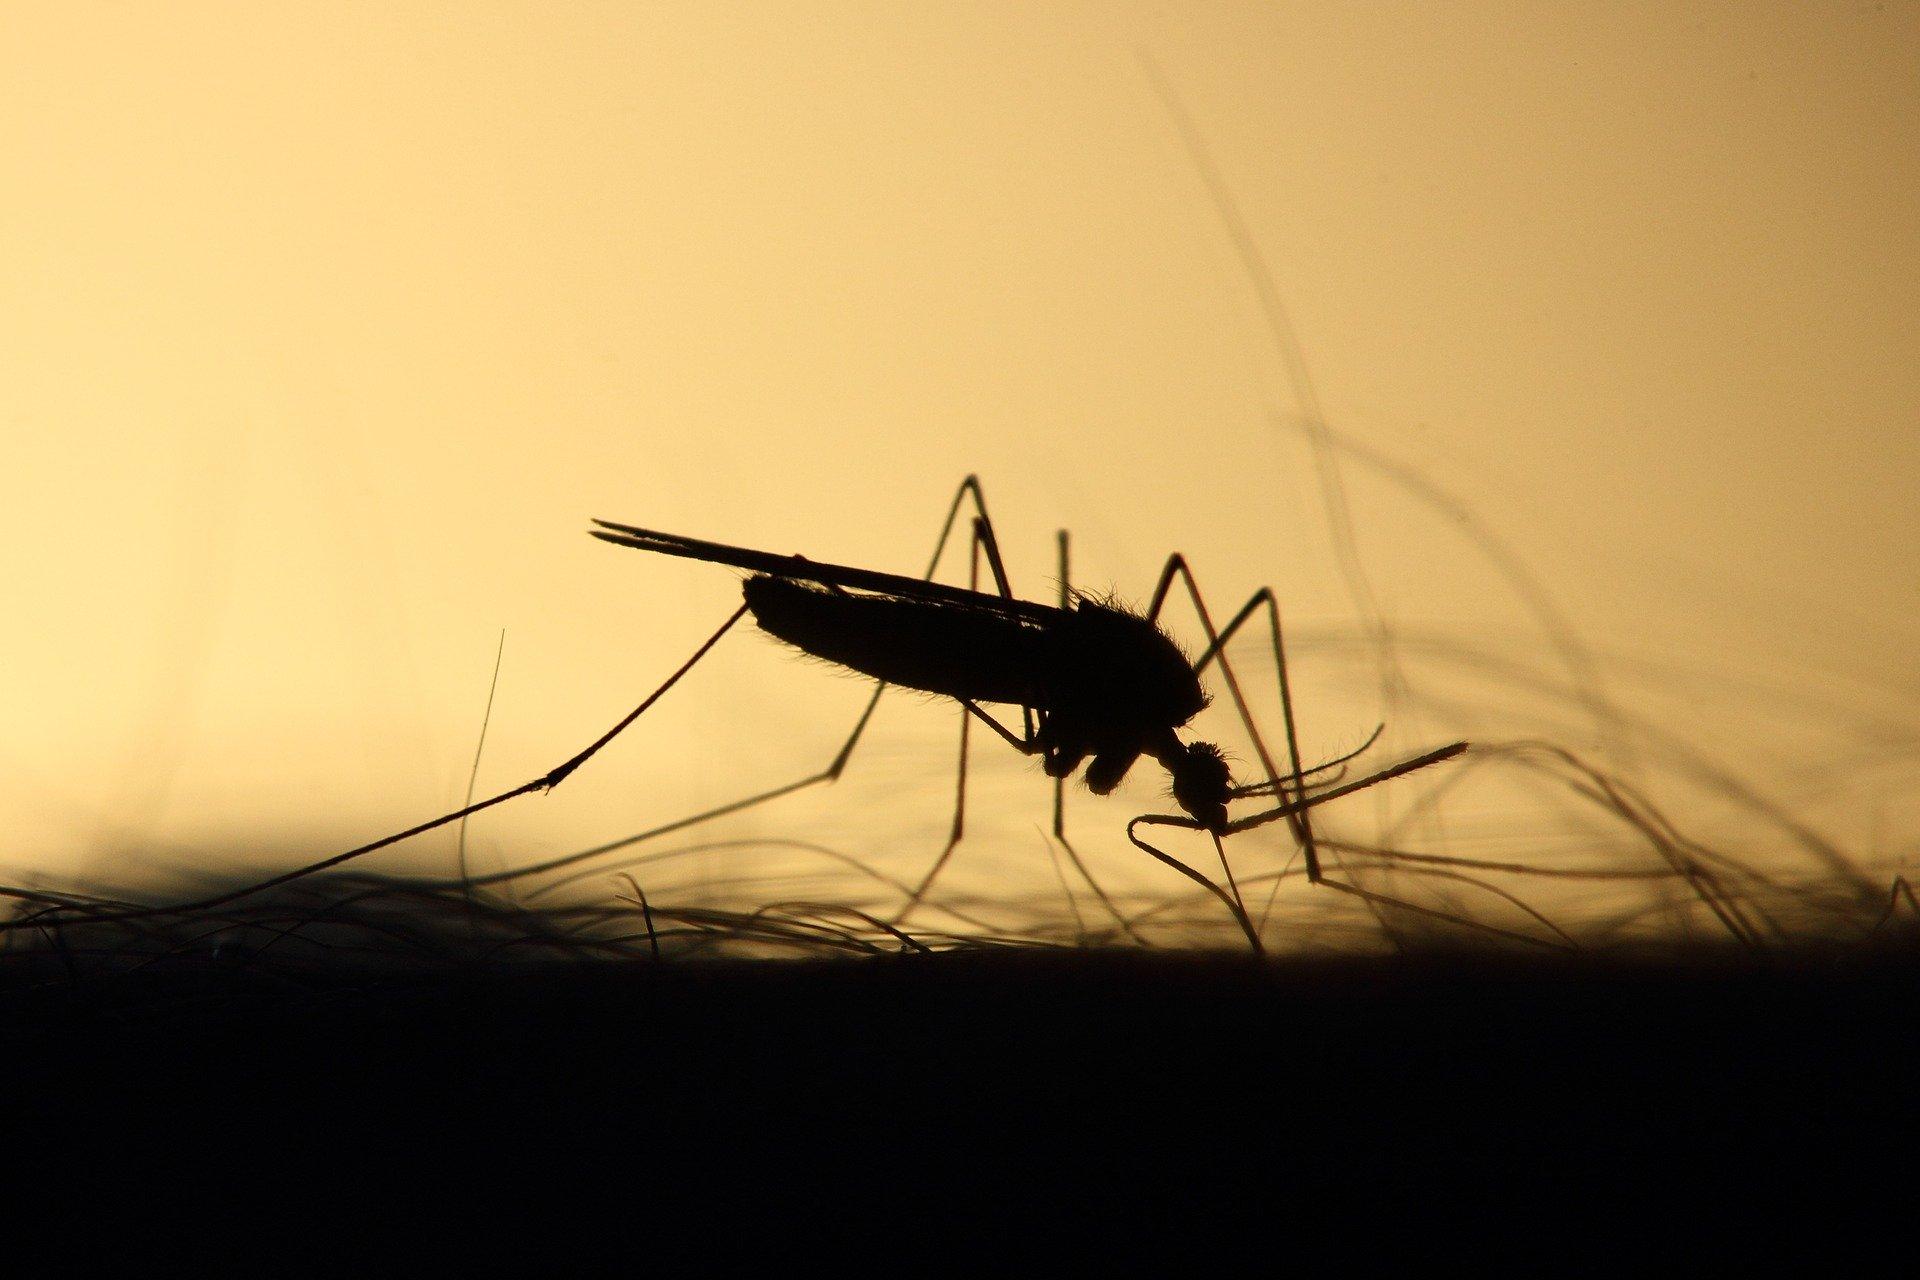 Best Ultrasonic Mosquito Repeller